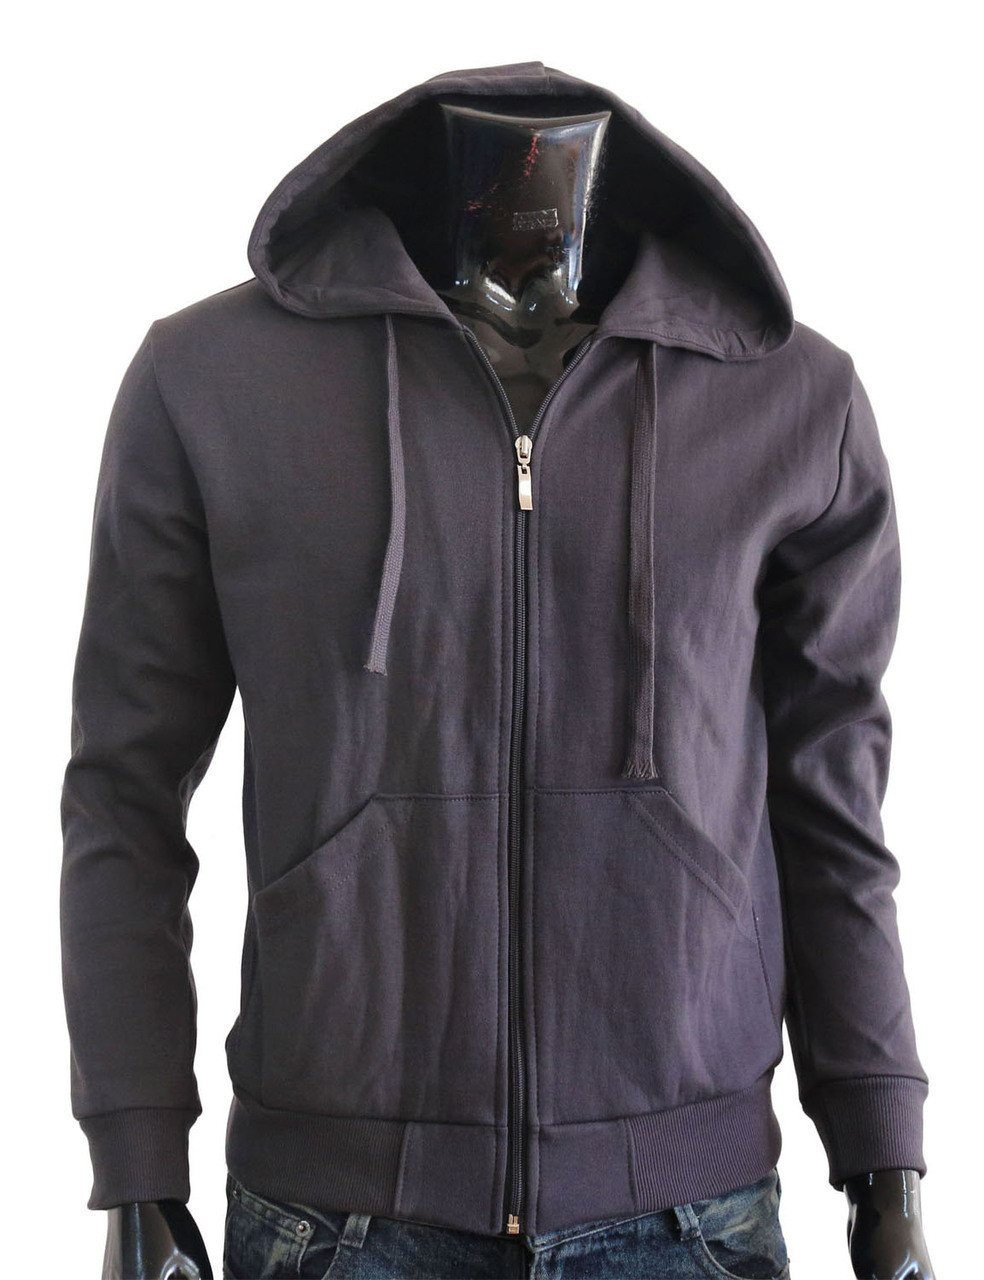 7f94746d2a8a BCPOLO zipper hoodie jumper Zip-Hoodie